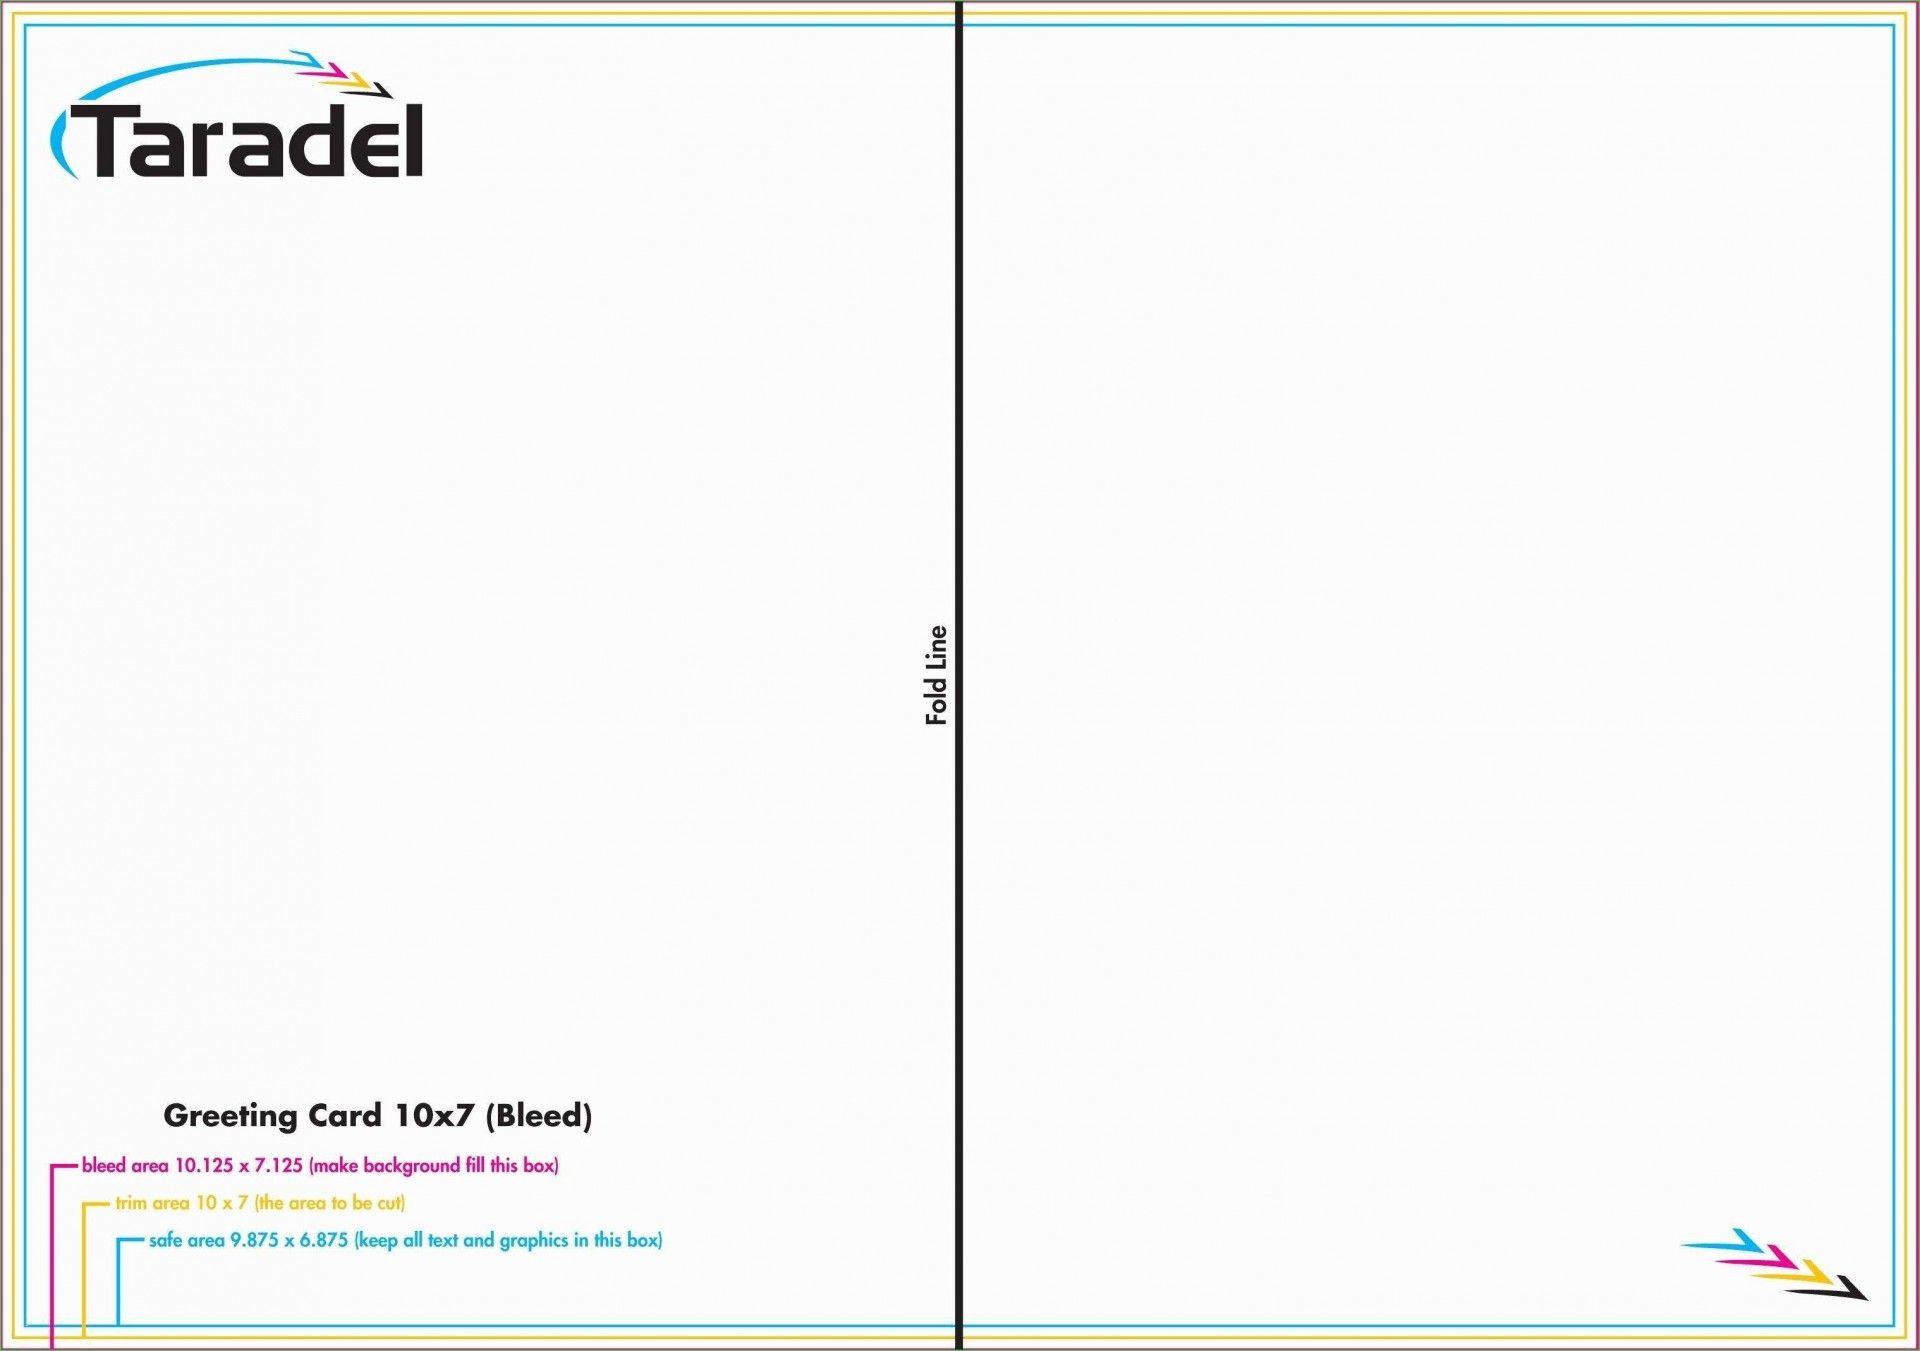 003 quarter fold card template photoshop indesign greeting